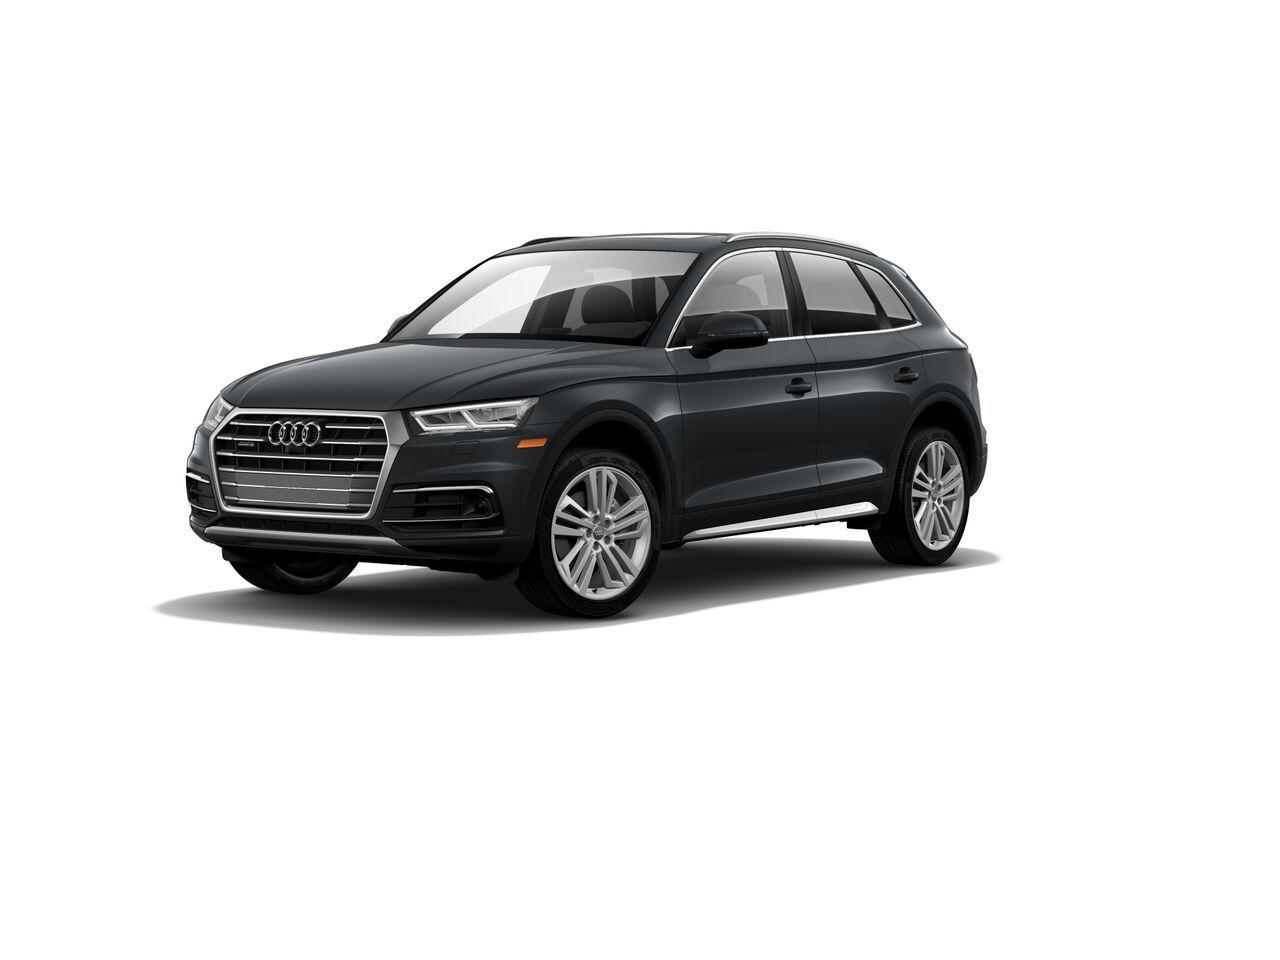 Build Audi Q5 >> Build Your Own Custom Audi Q5 Audi Usa Vehicles Audi Cars